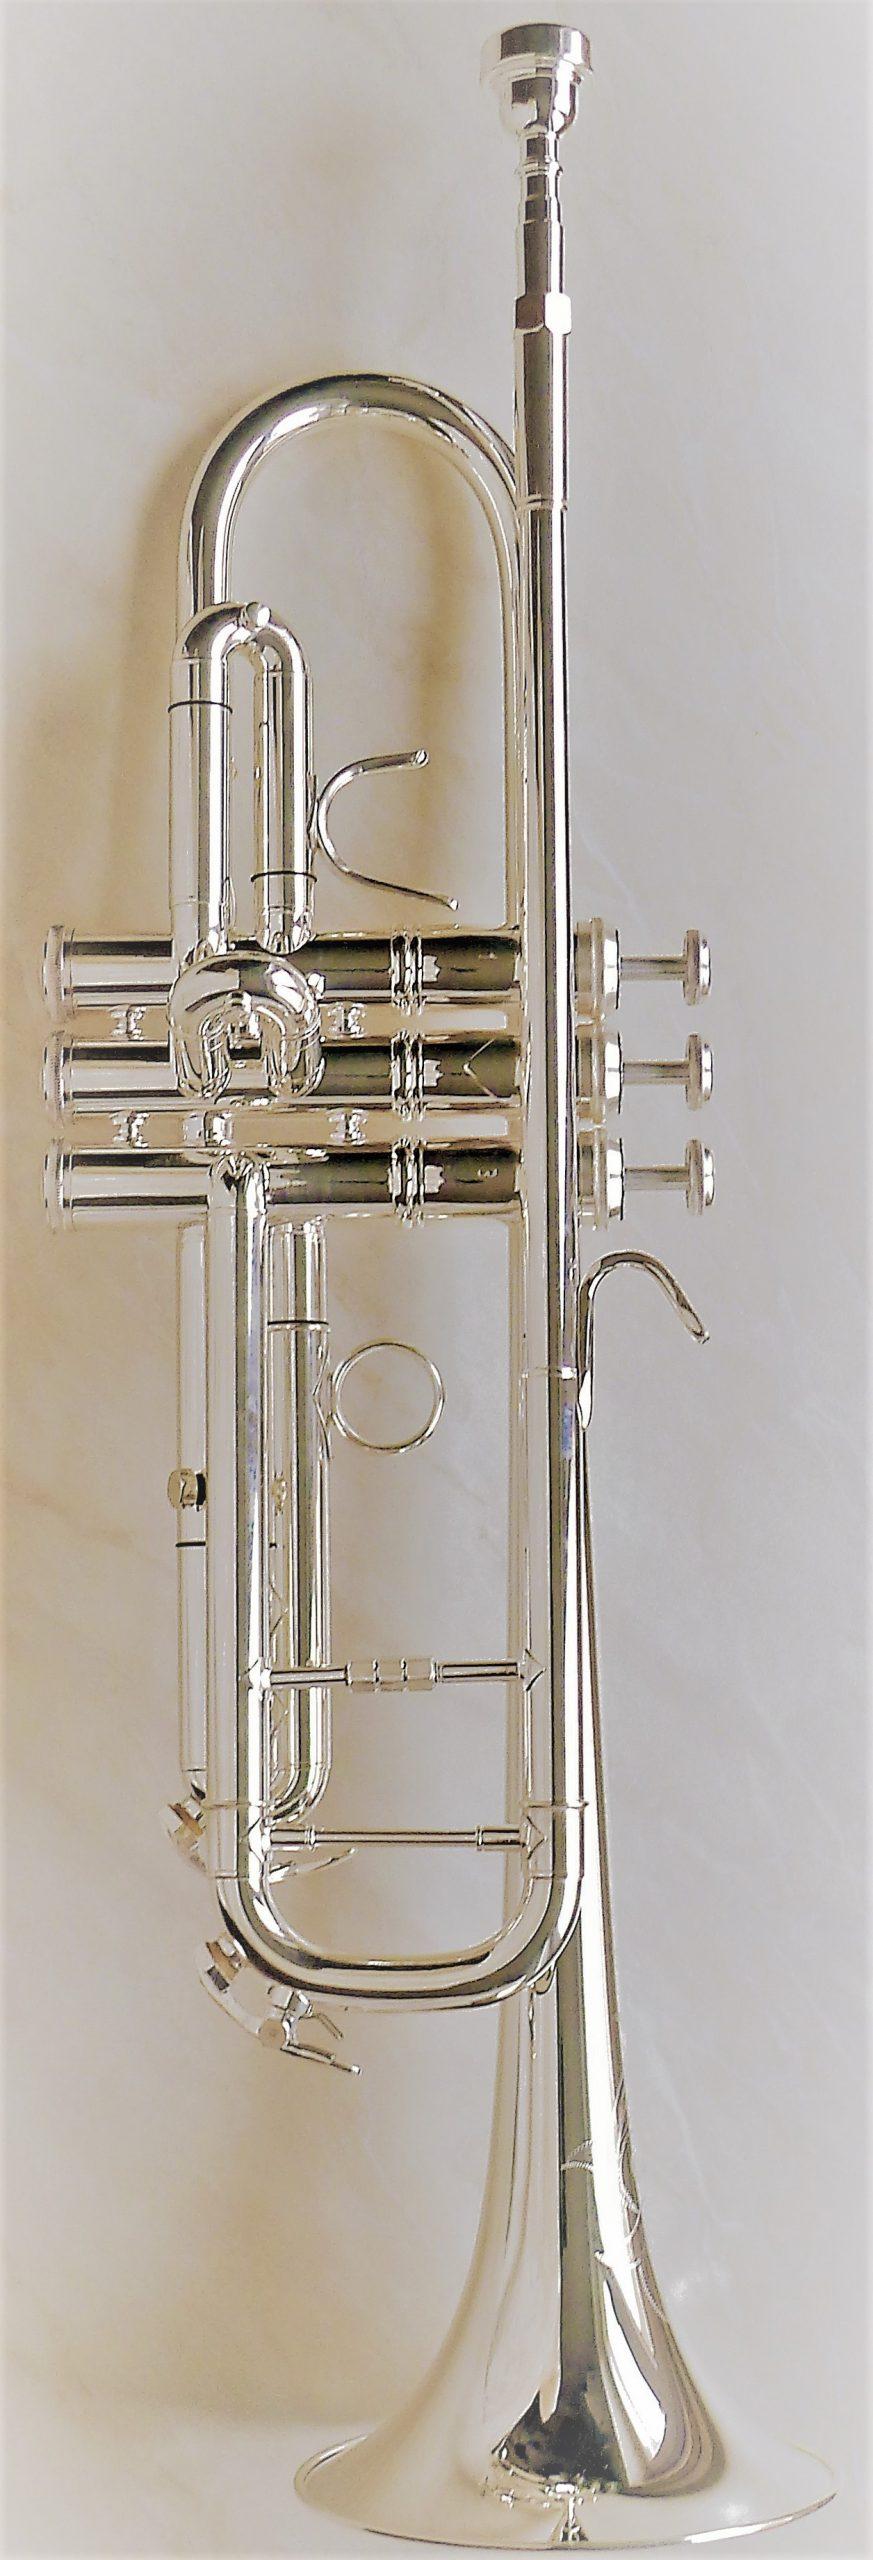 Bb-Trompete